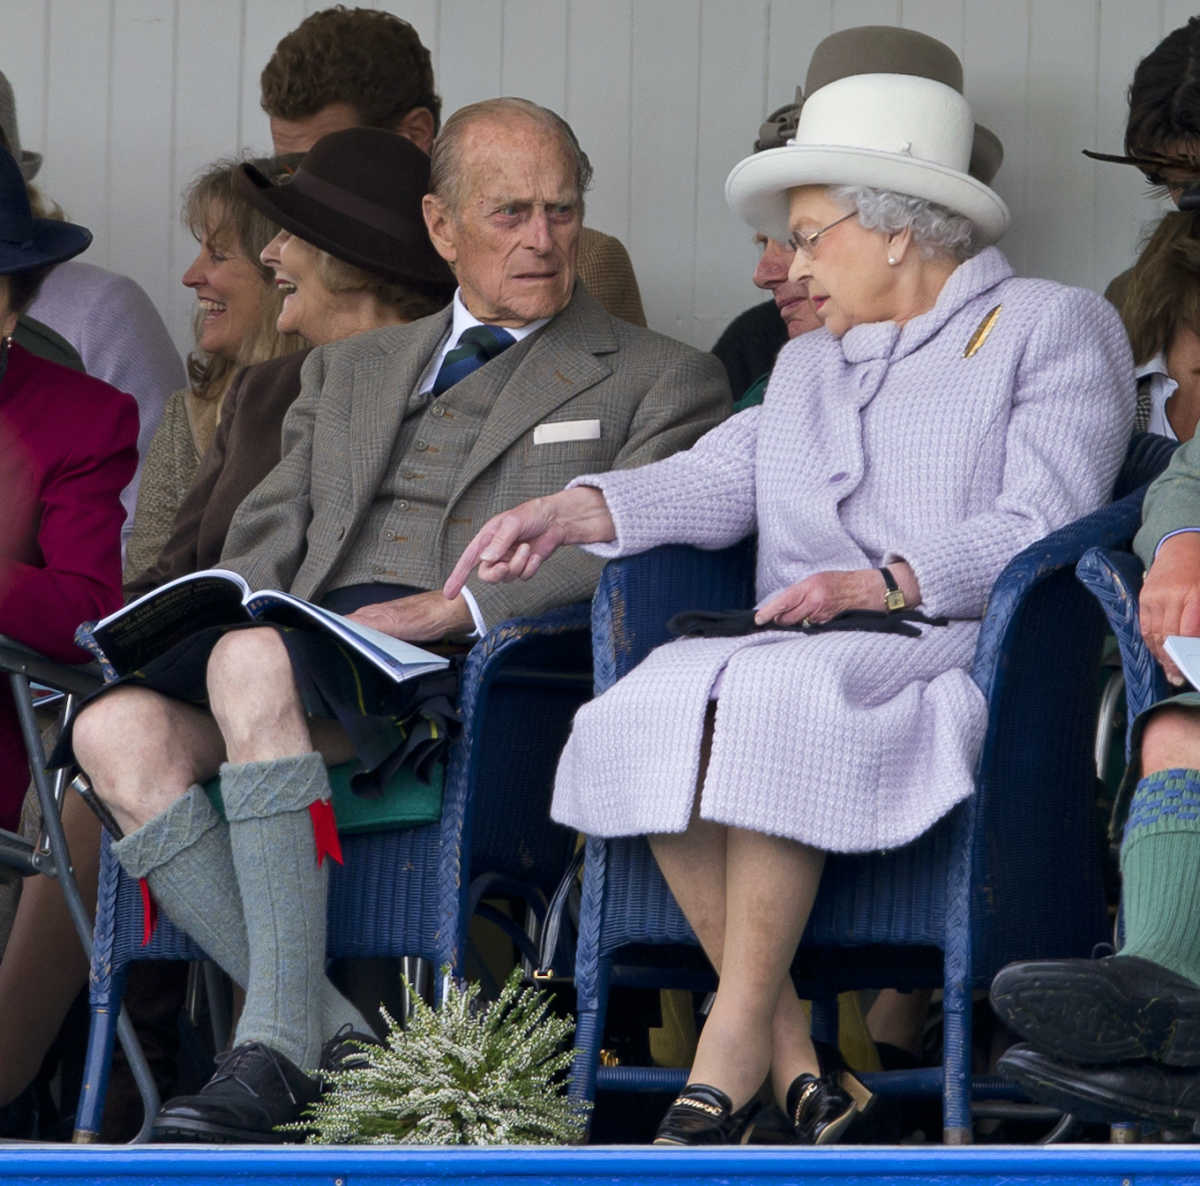 Prince Philip kilt Queen Elizabeth